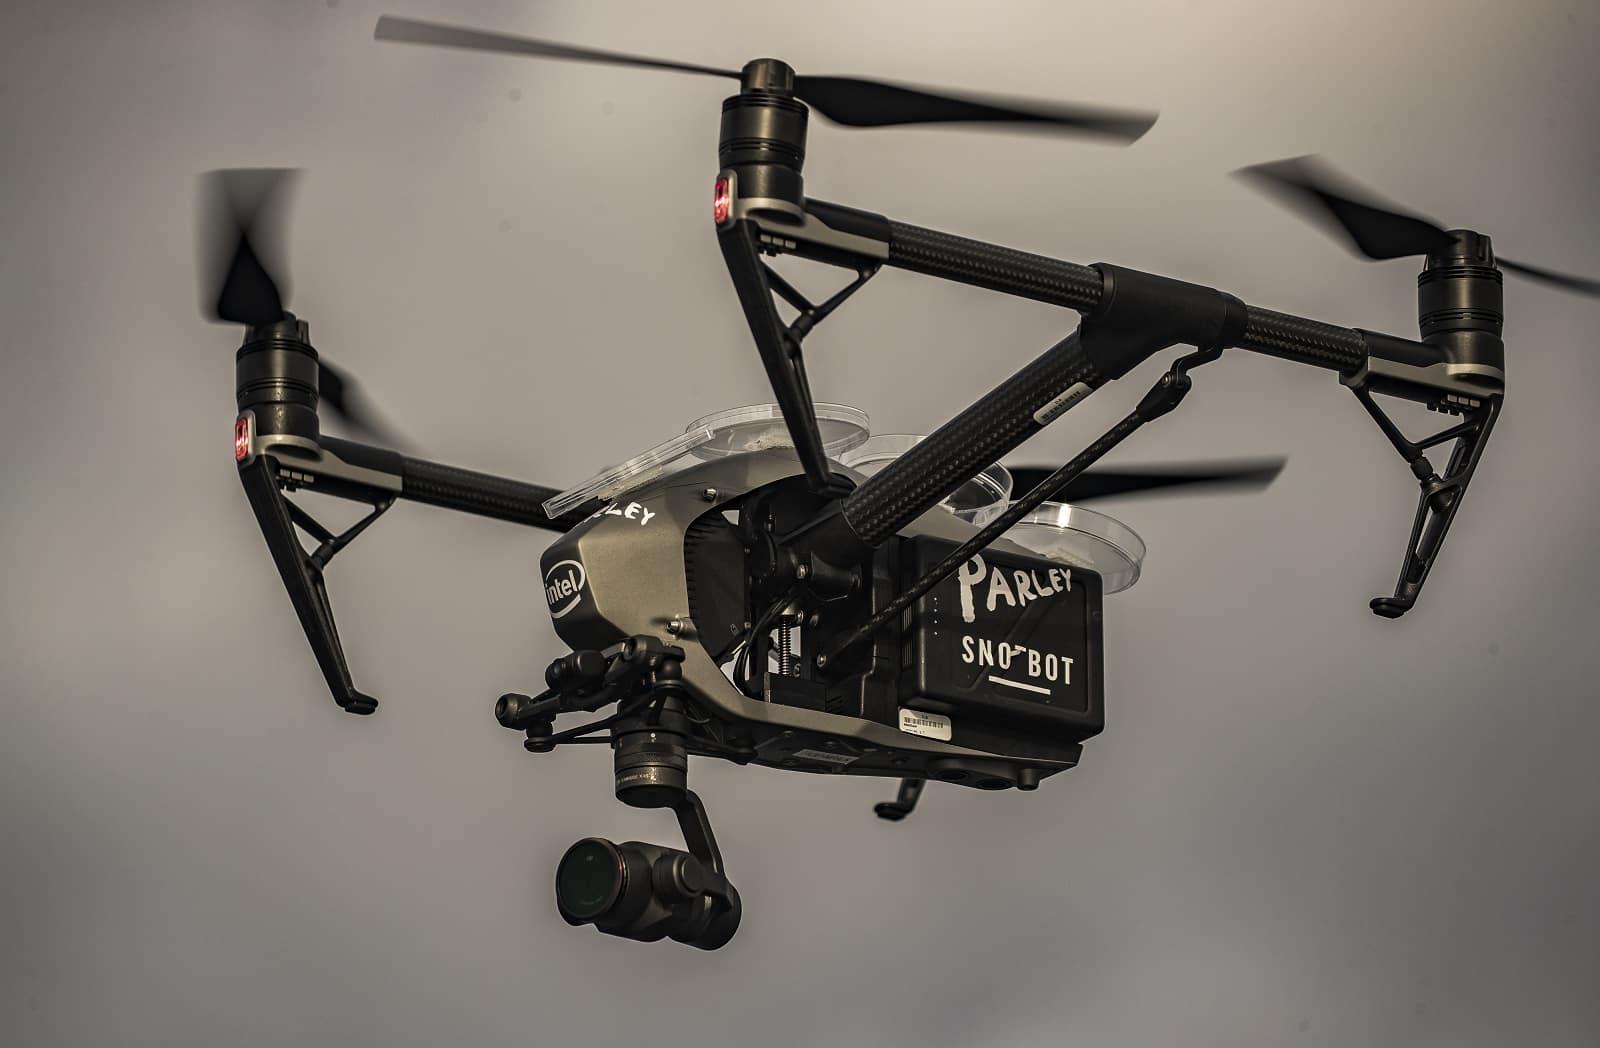 Intel SnotBot AI 7 resize - มารู้จักกับเทคโนโลยีที่จะช่วยรักษาสัตว์ป่าใกล้สูญพันธุ์